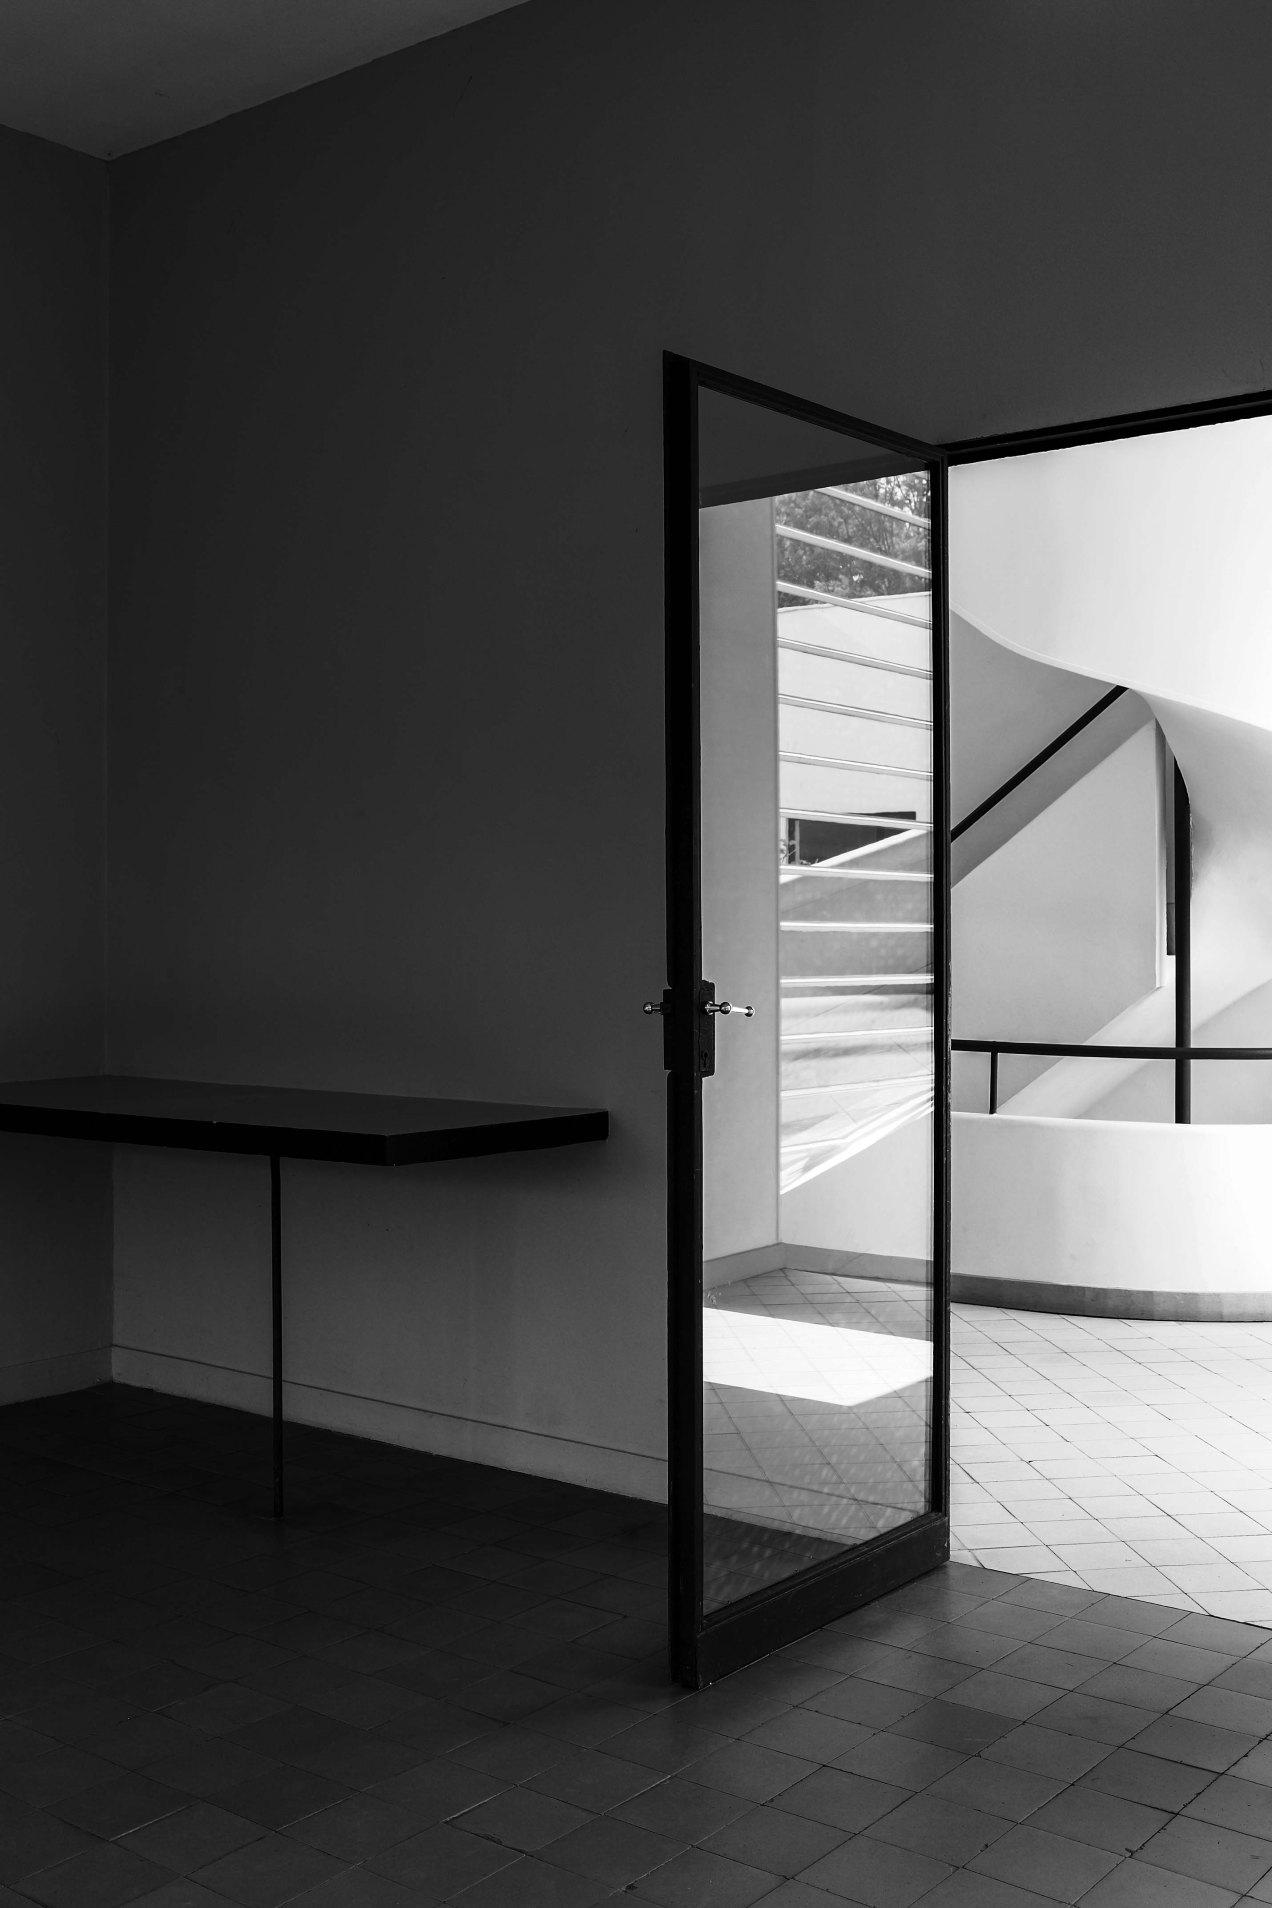 Escalier, Le Corbusier, Villa Savoye, gildalliere, 2007